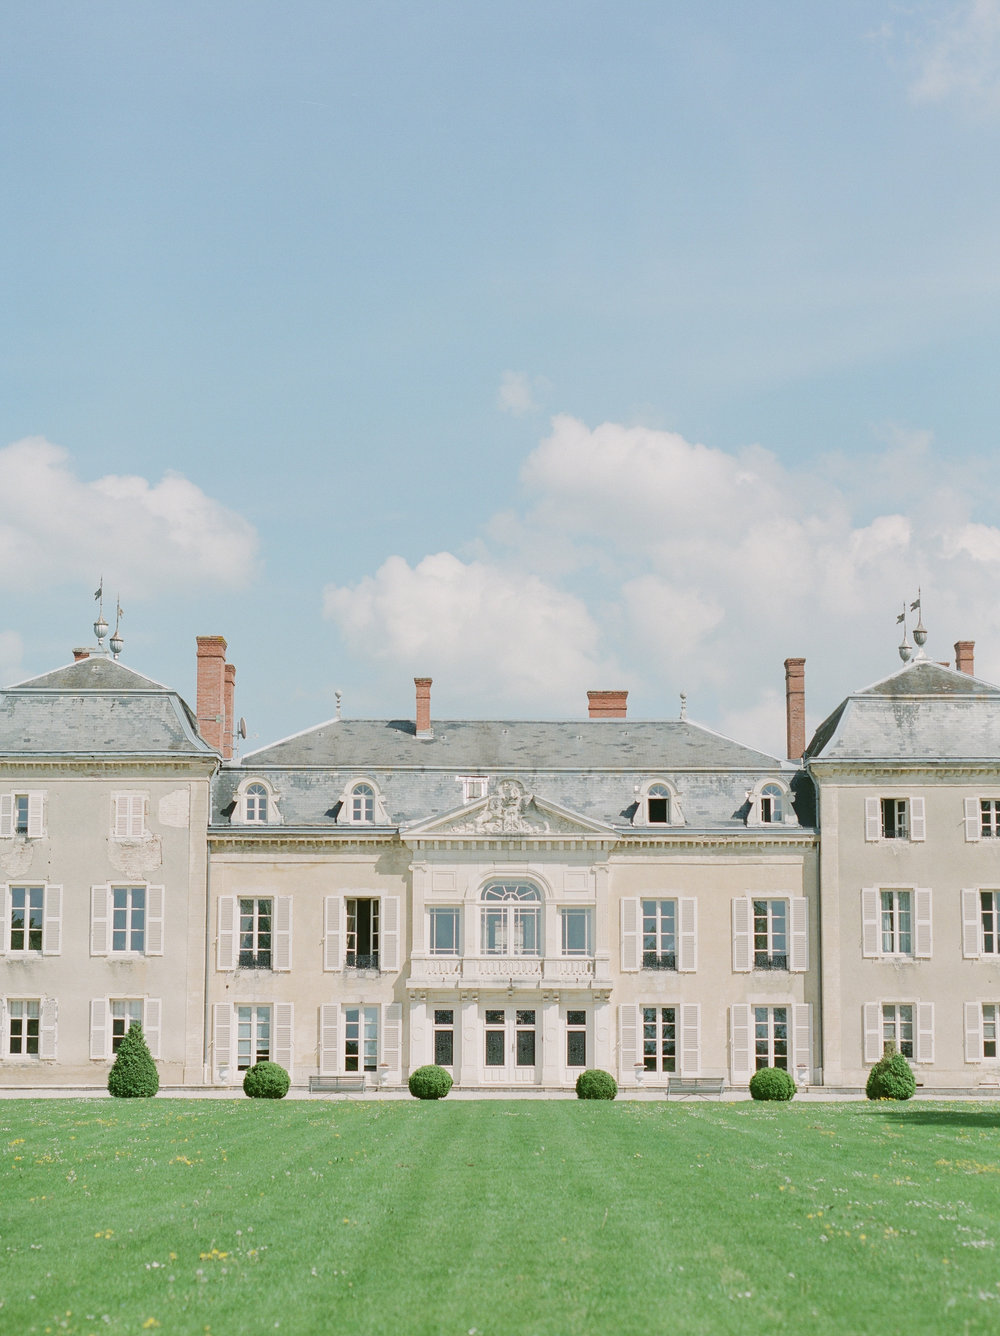 Garance + Adrien - Chateau de Varennes Wedding, France